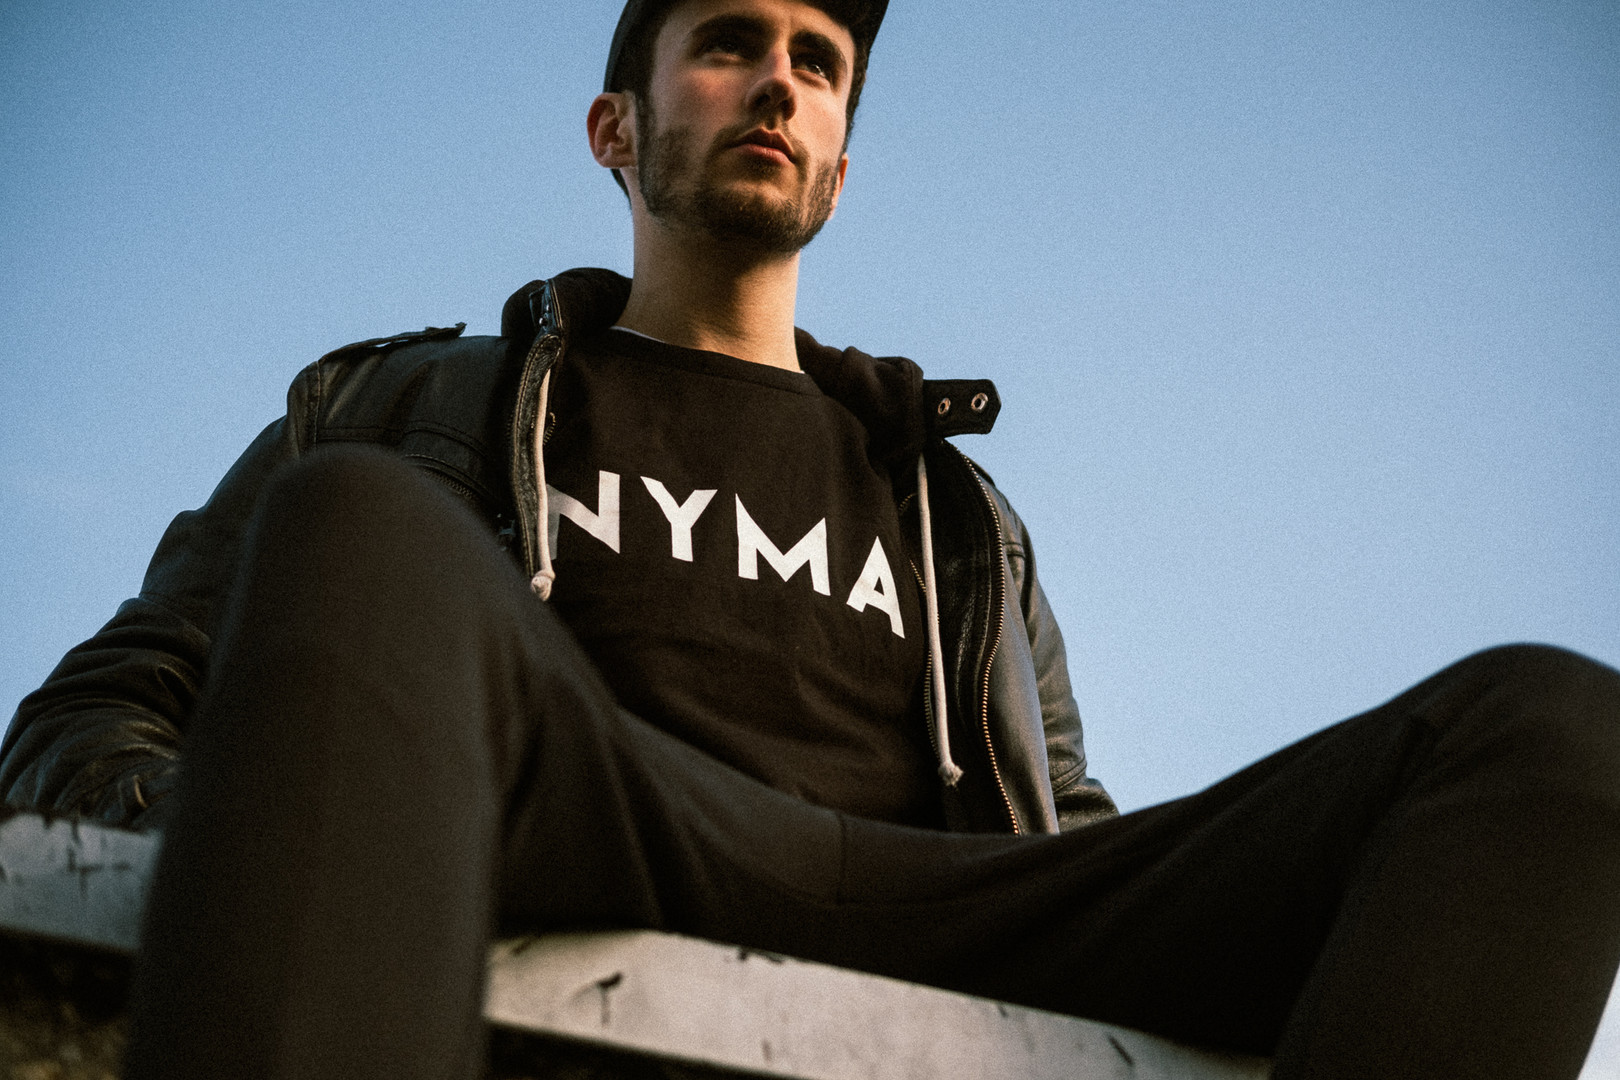 NYMA_AlexKleis (4 von 34).jpg